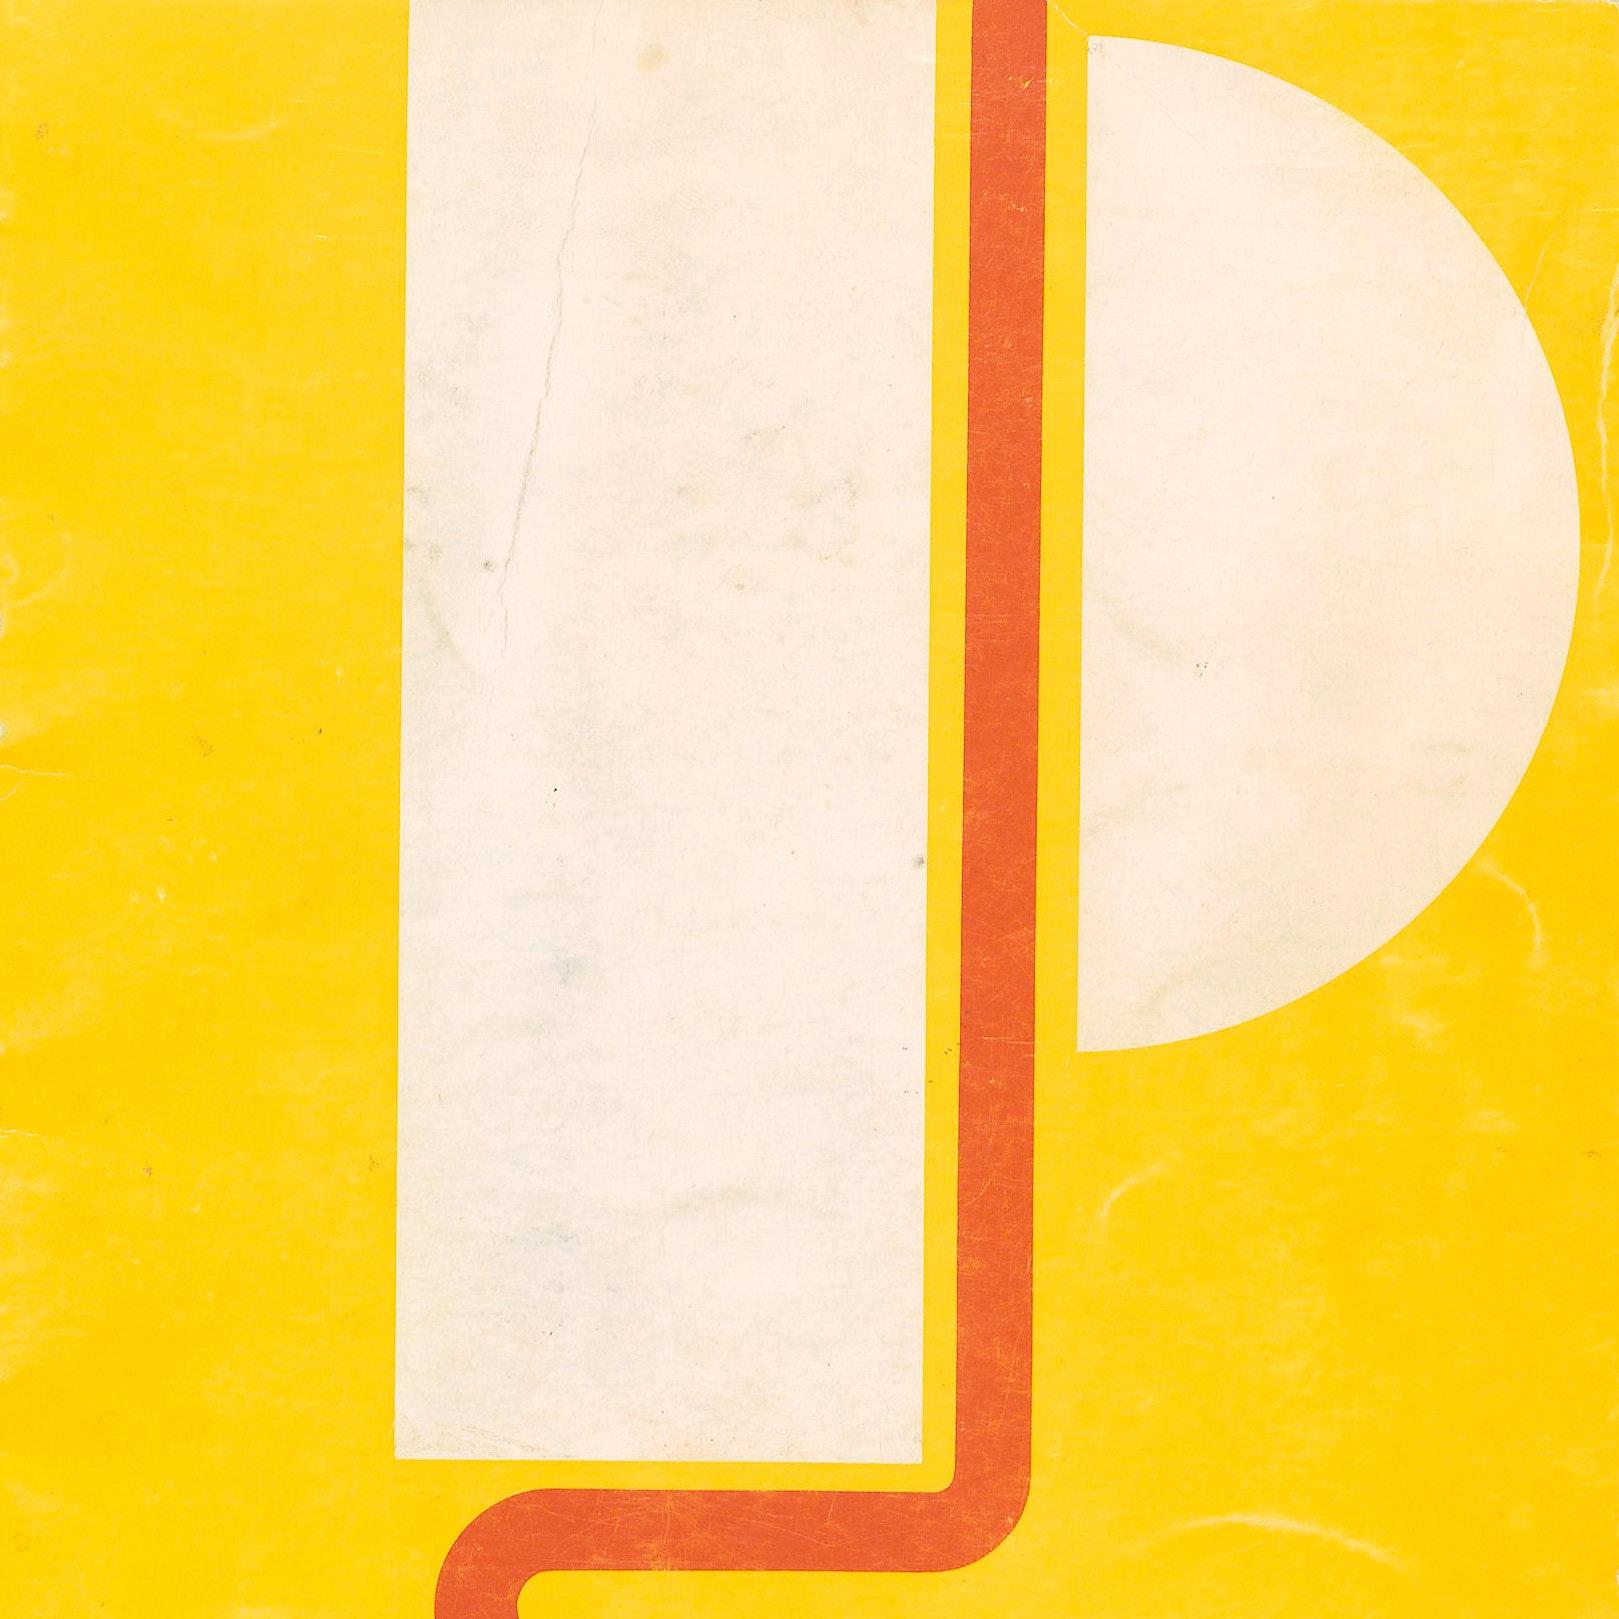 Art exhibition catalog